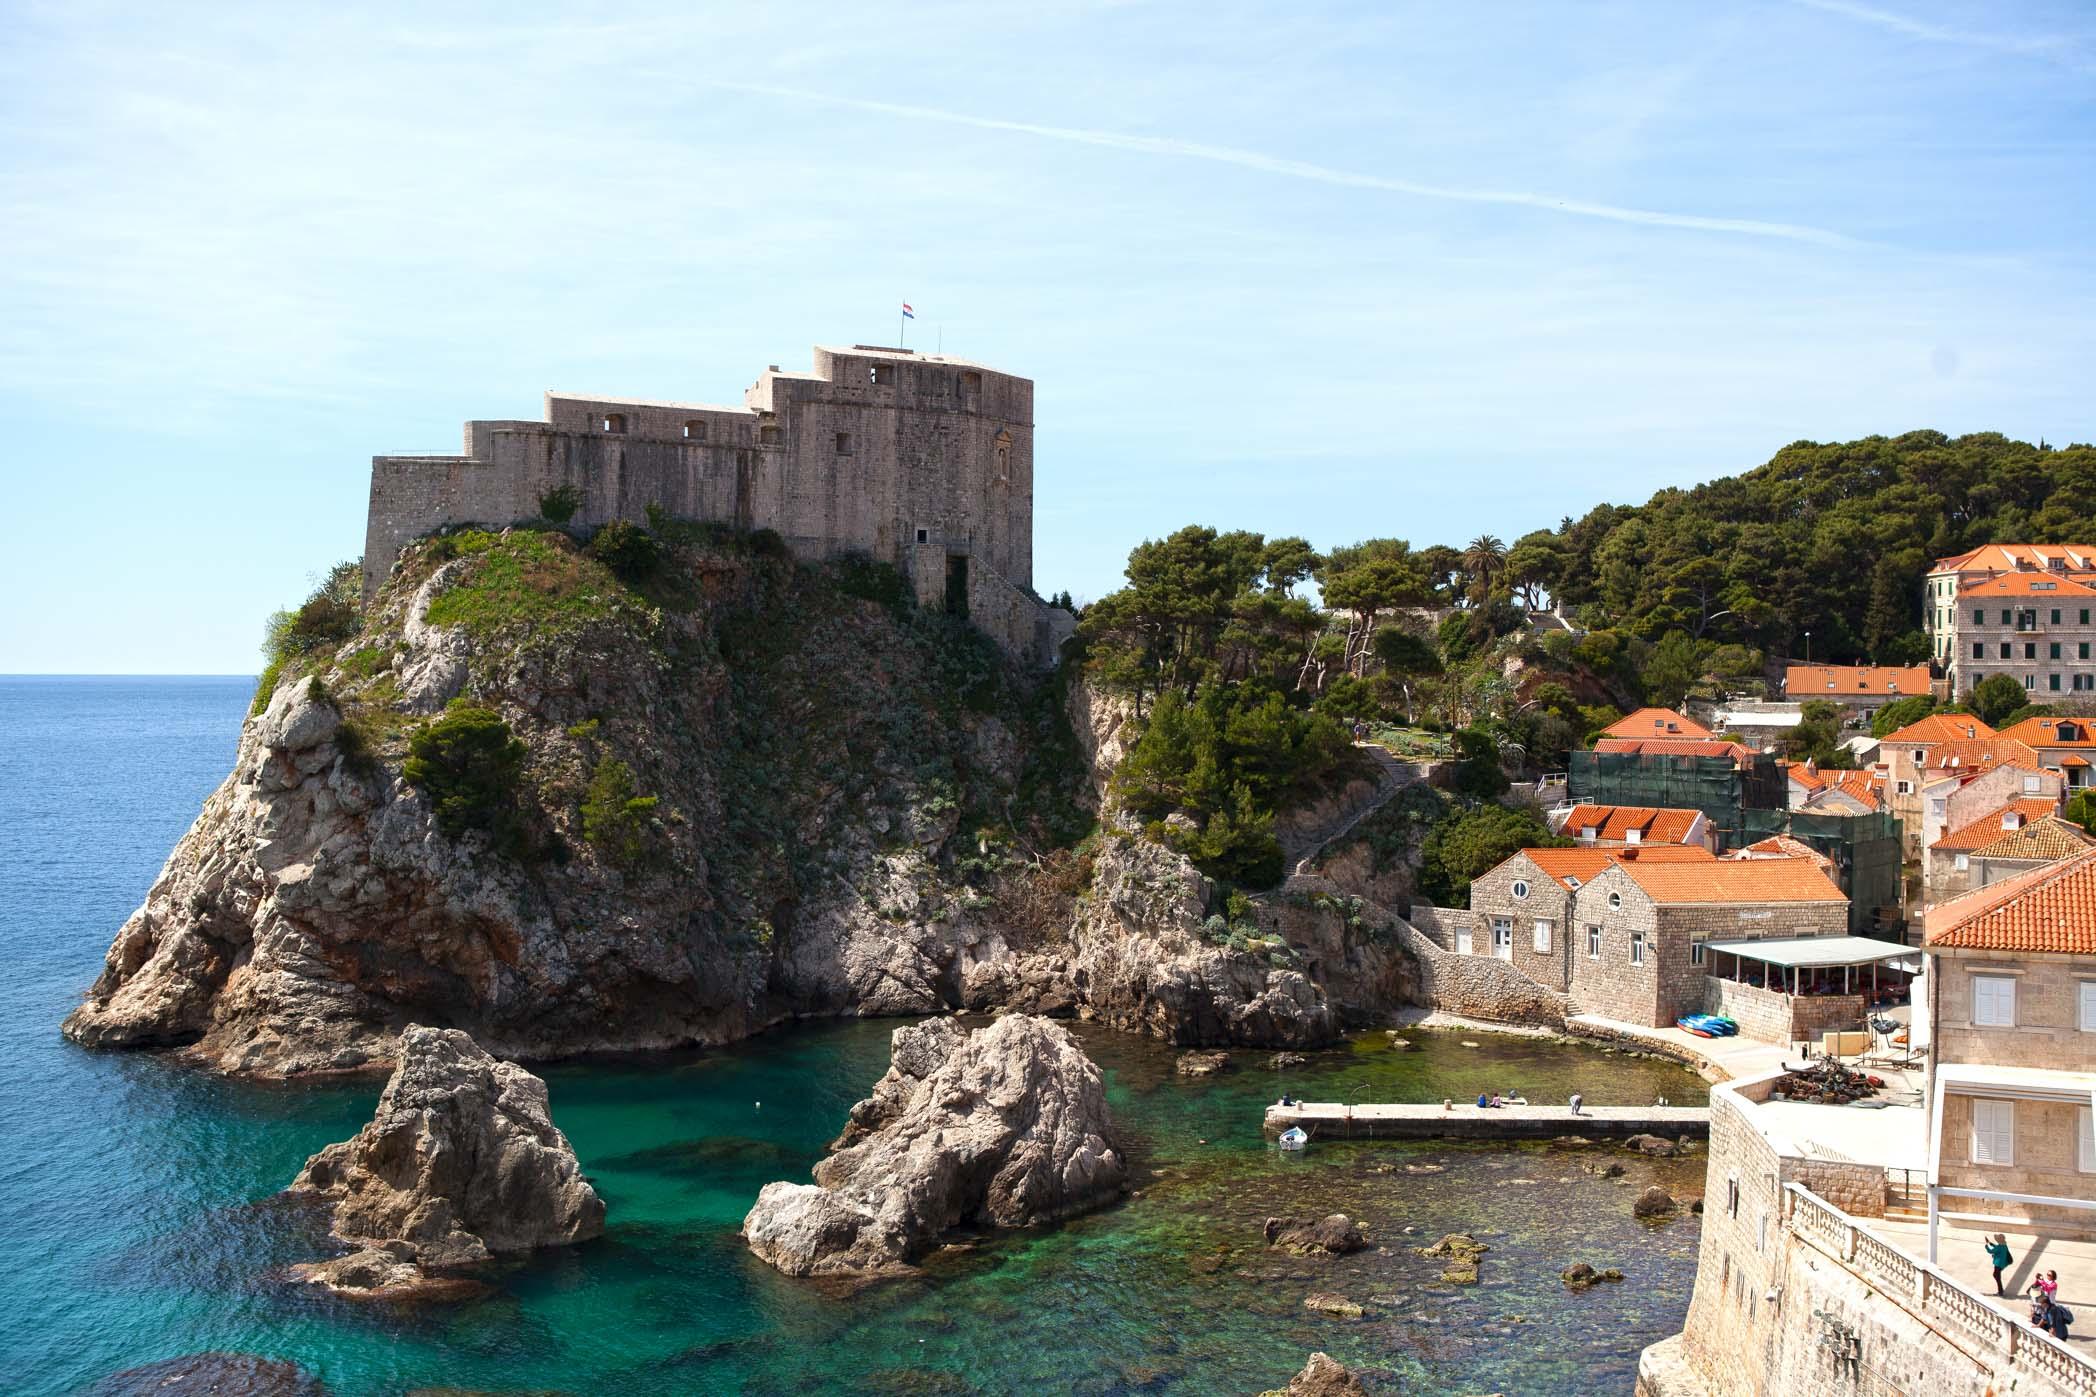 Fort Lovrijenac, taken from the wall surrounding Dubrovnik